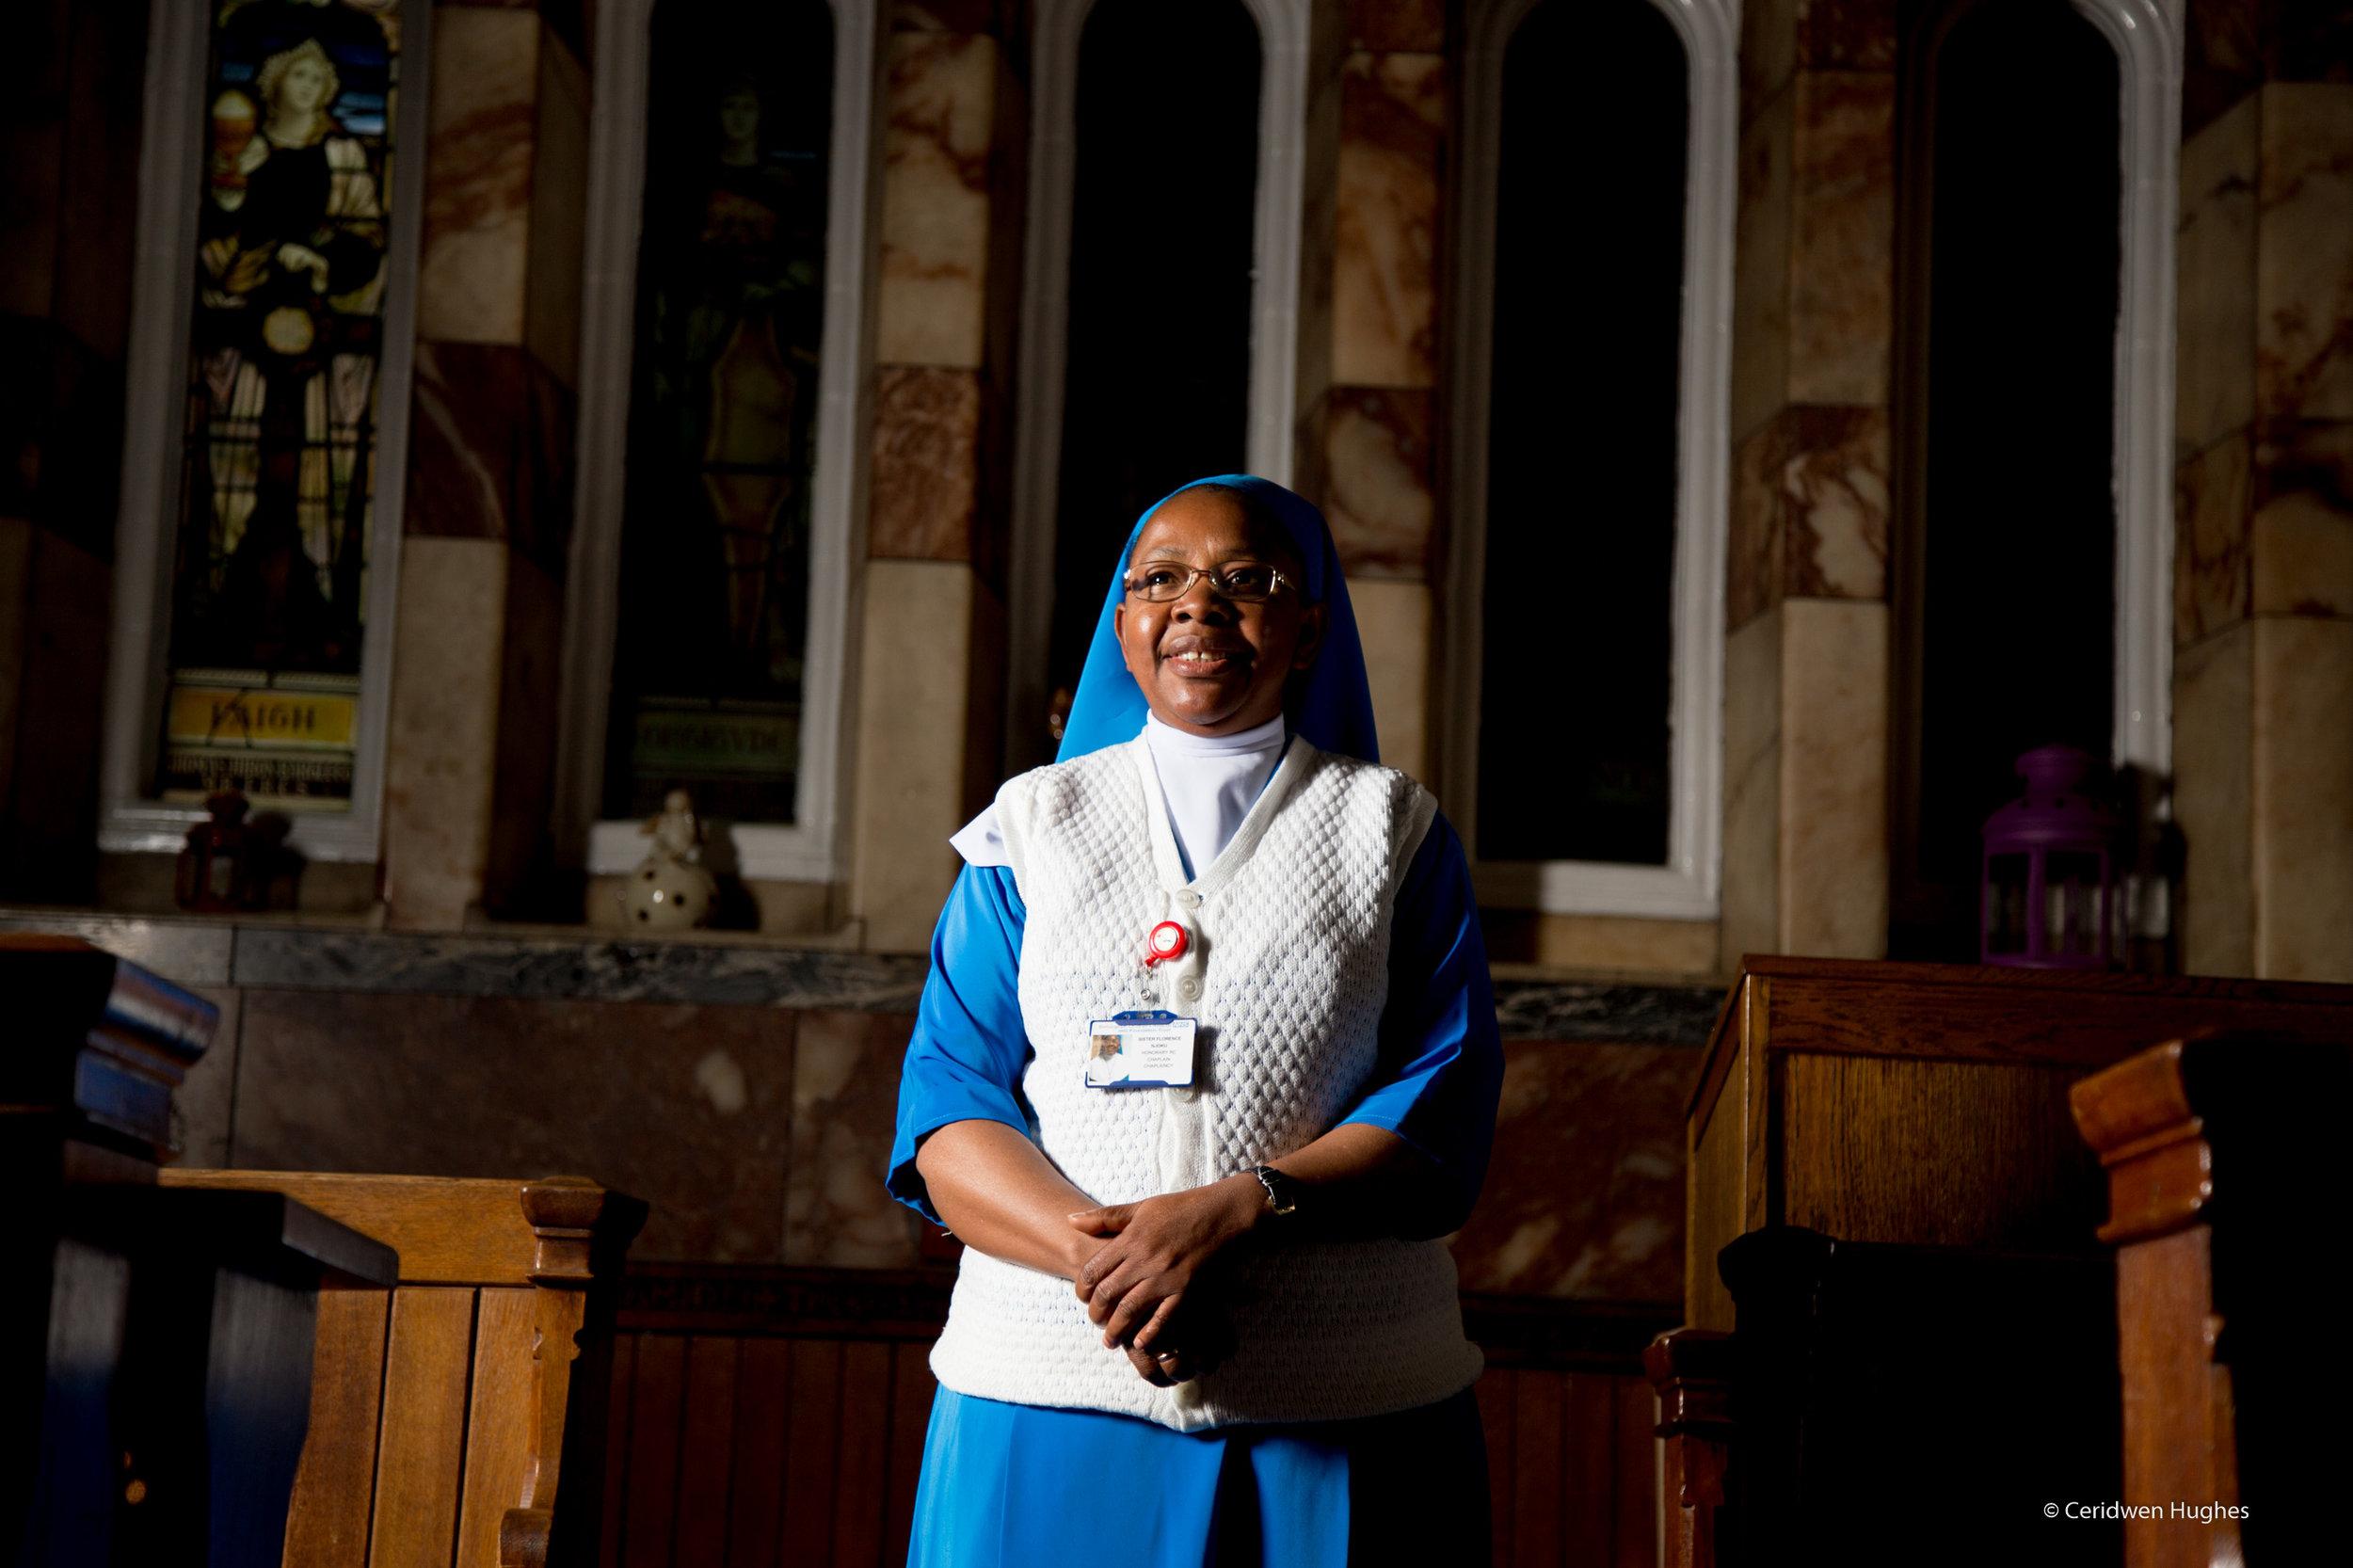 Sister Florence of Birmingham Children's Hospital